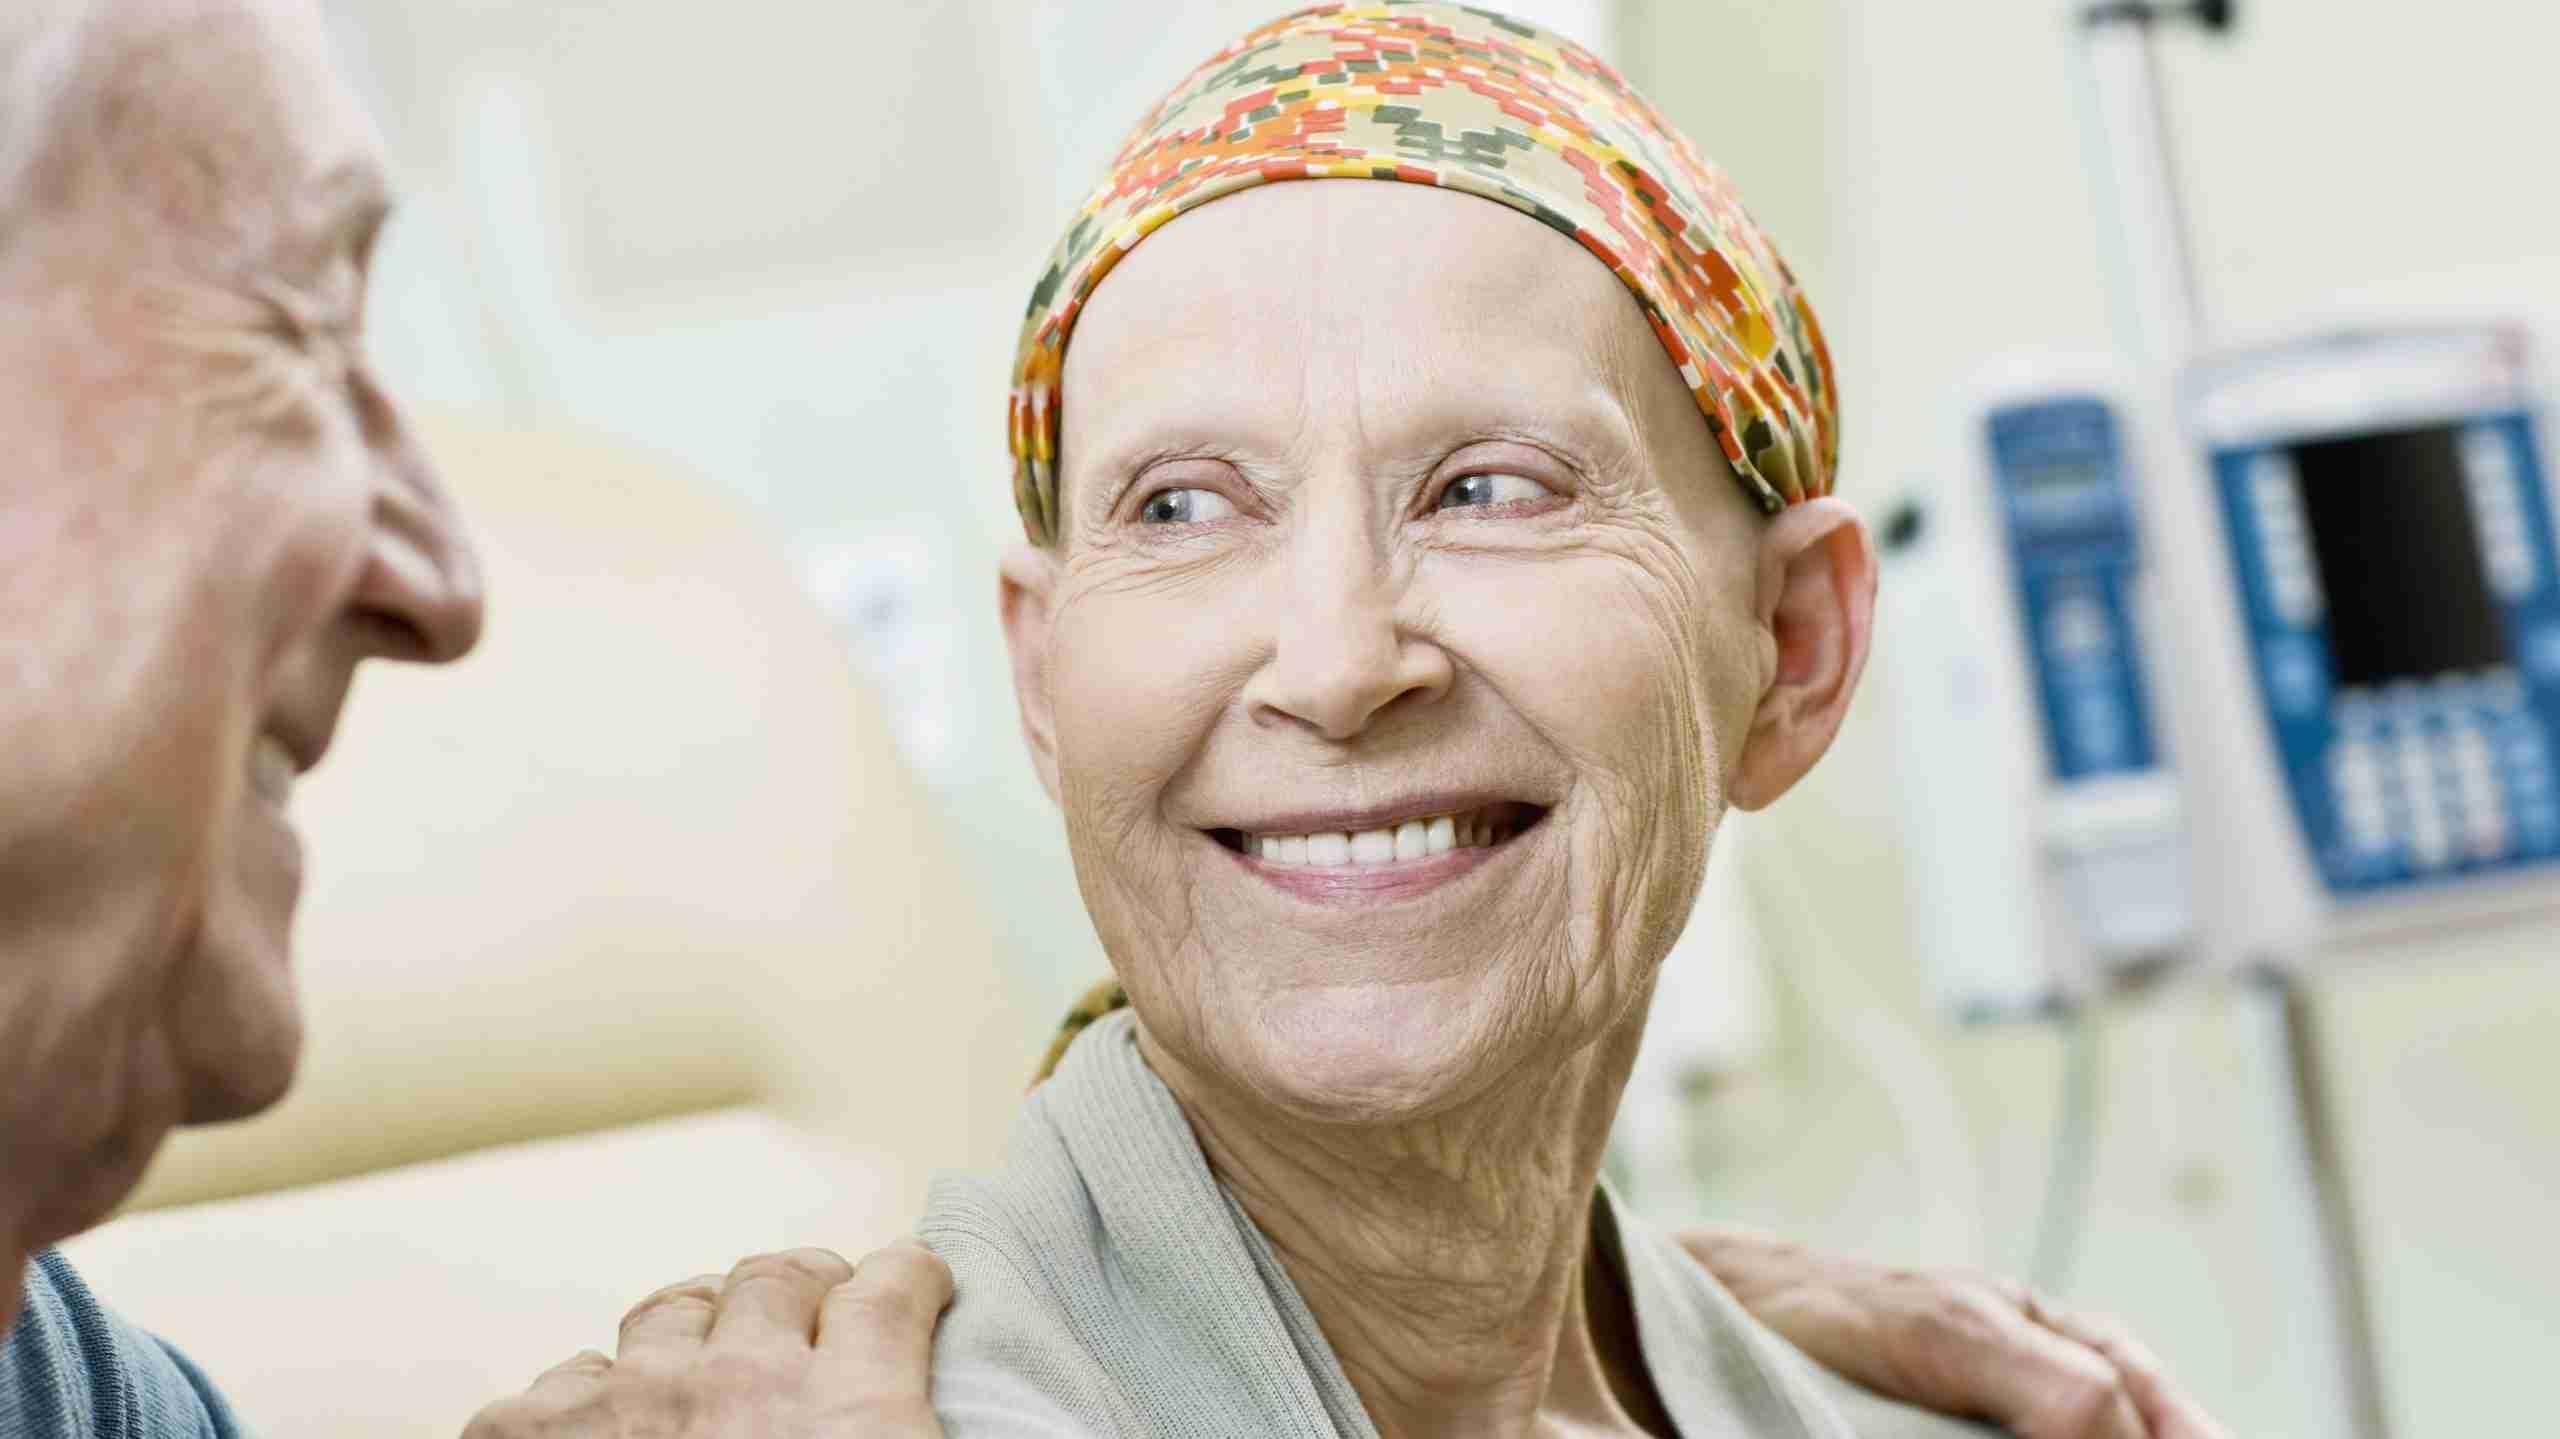 Alternative Anal Cancer Treatment in Scottsdale, Arizona